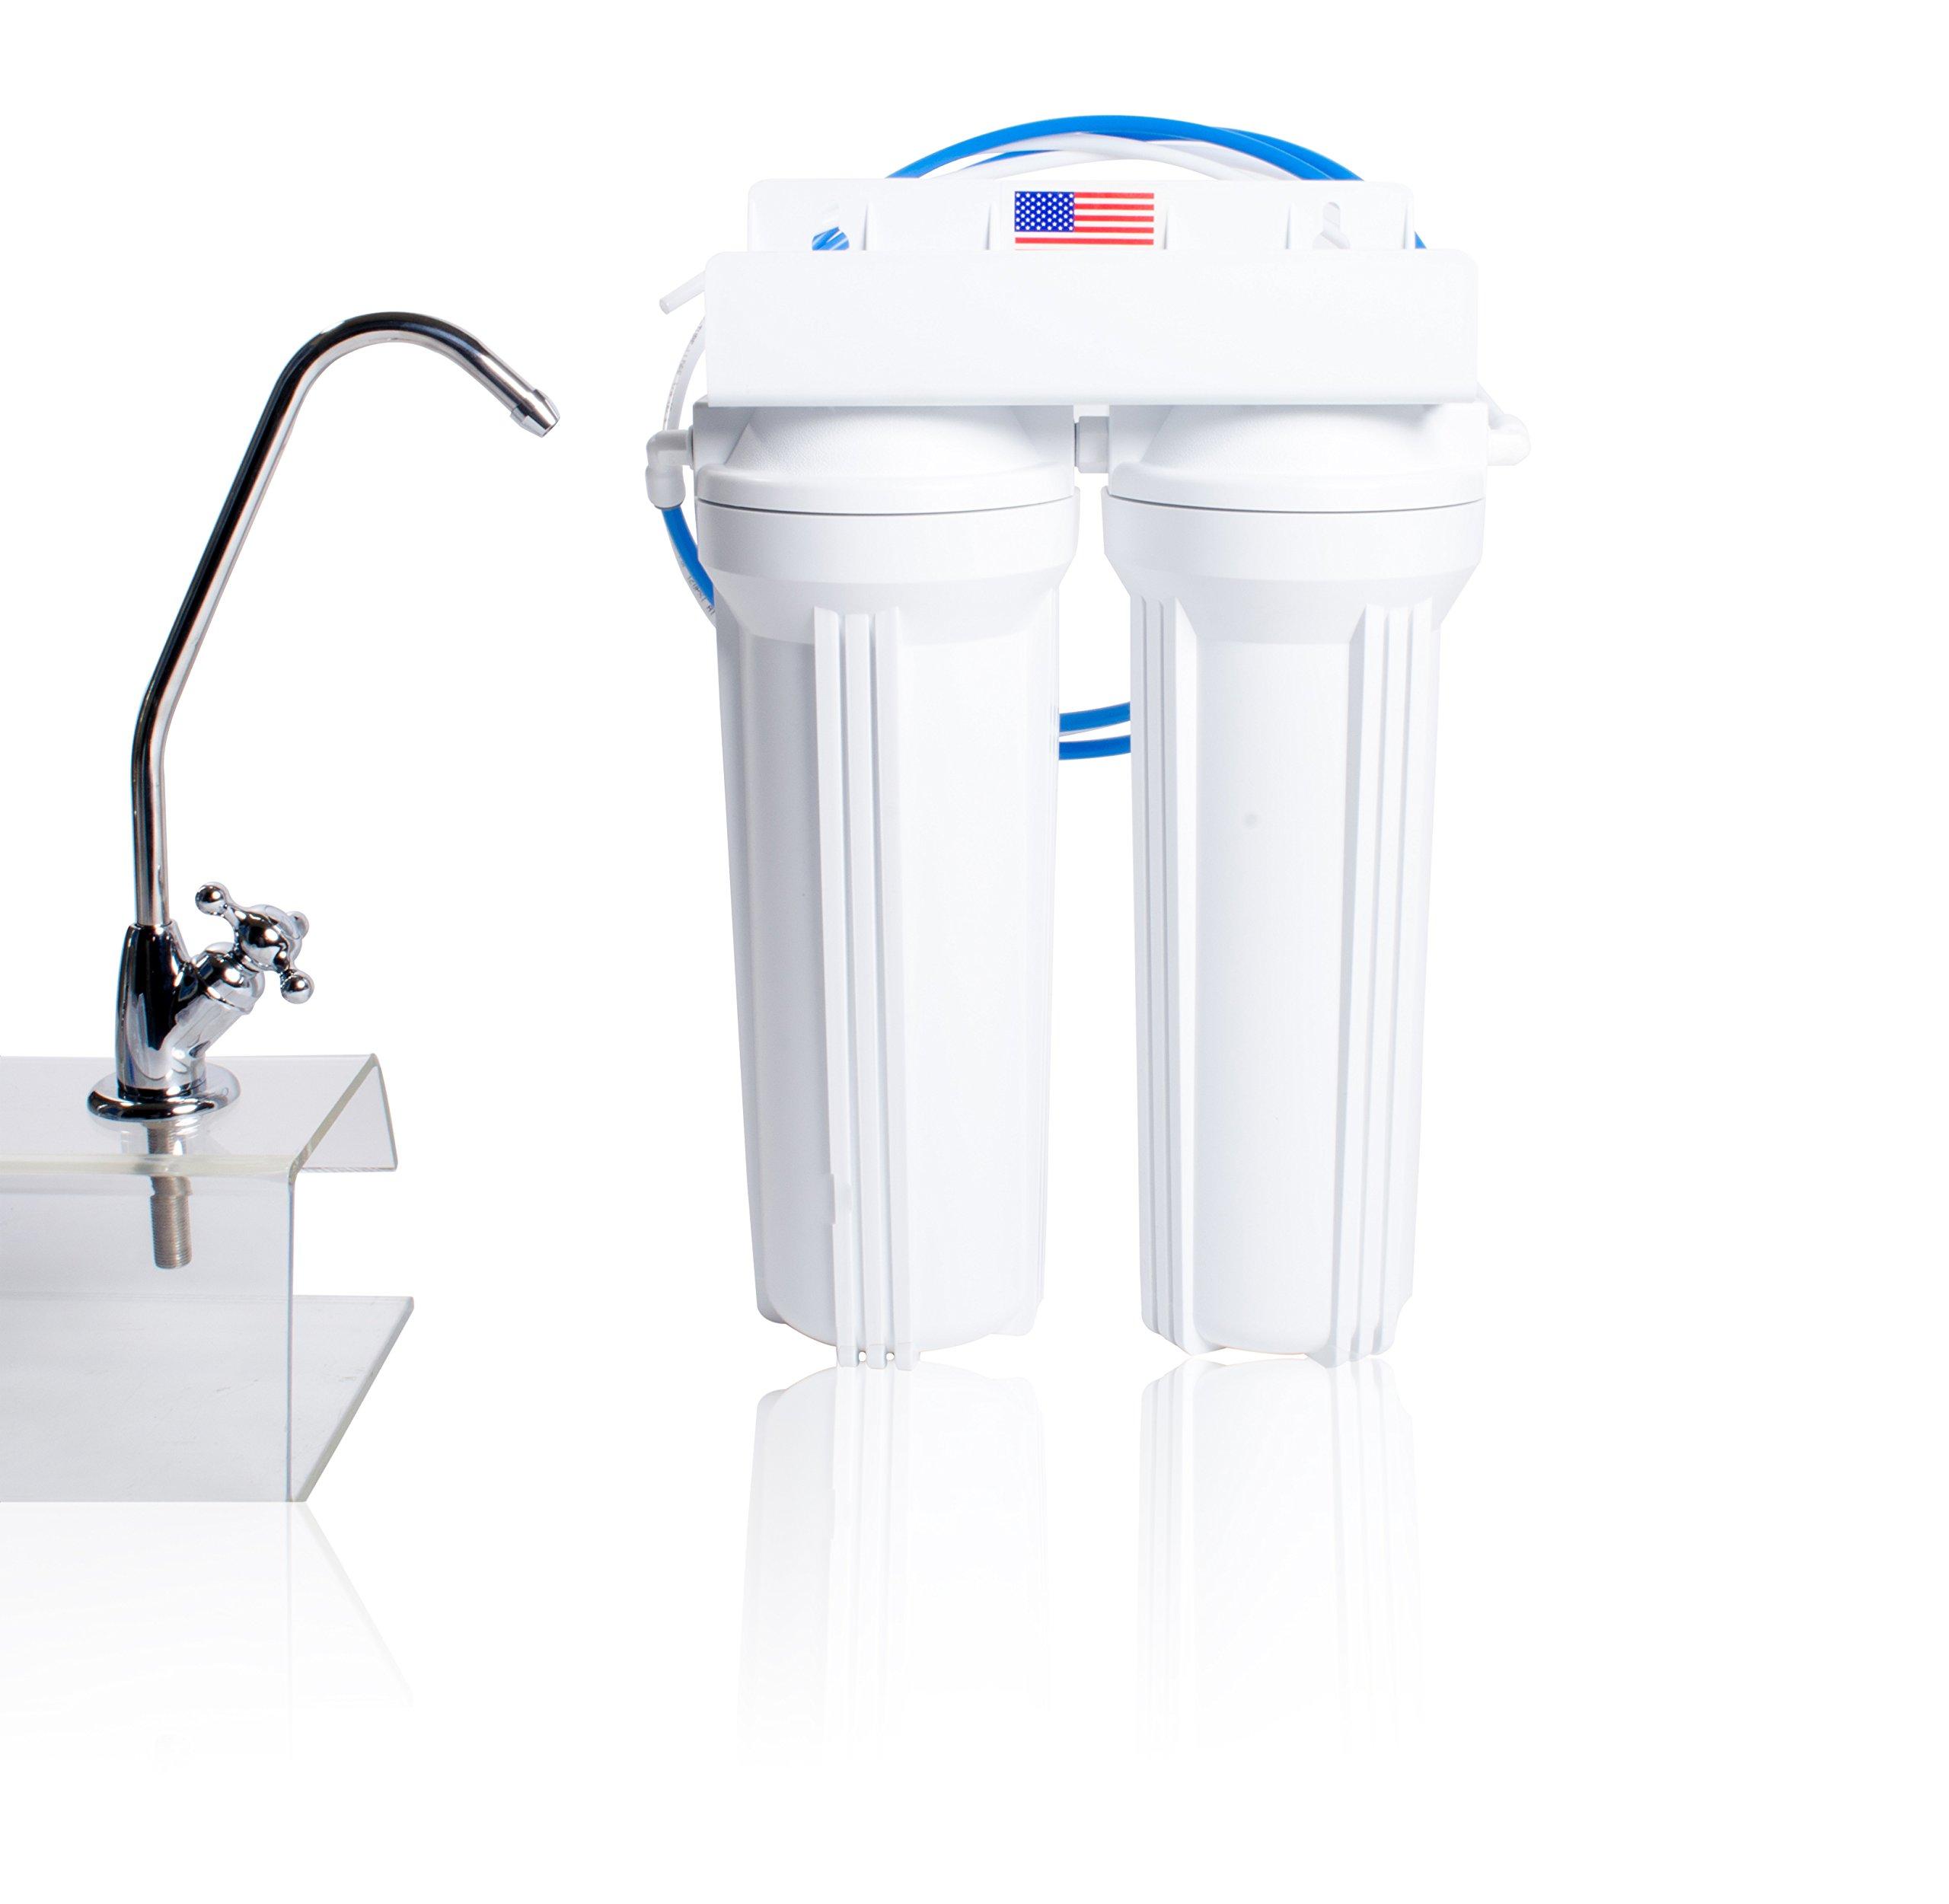 APEX MR-2020 Undercounter 2-Stage Drinking Water Filter